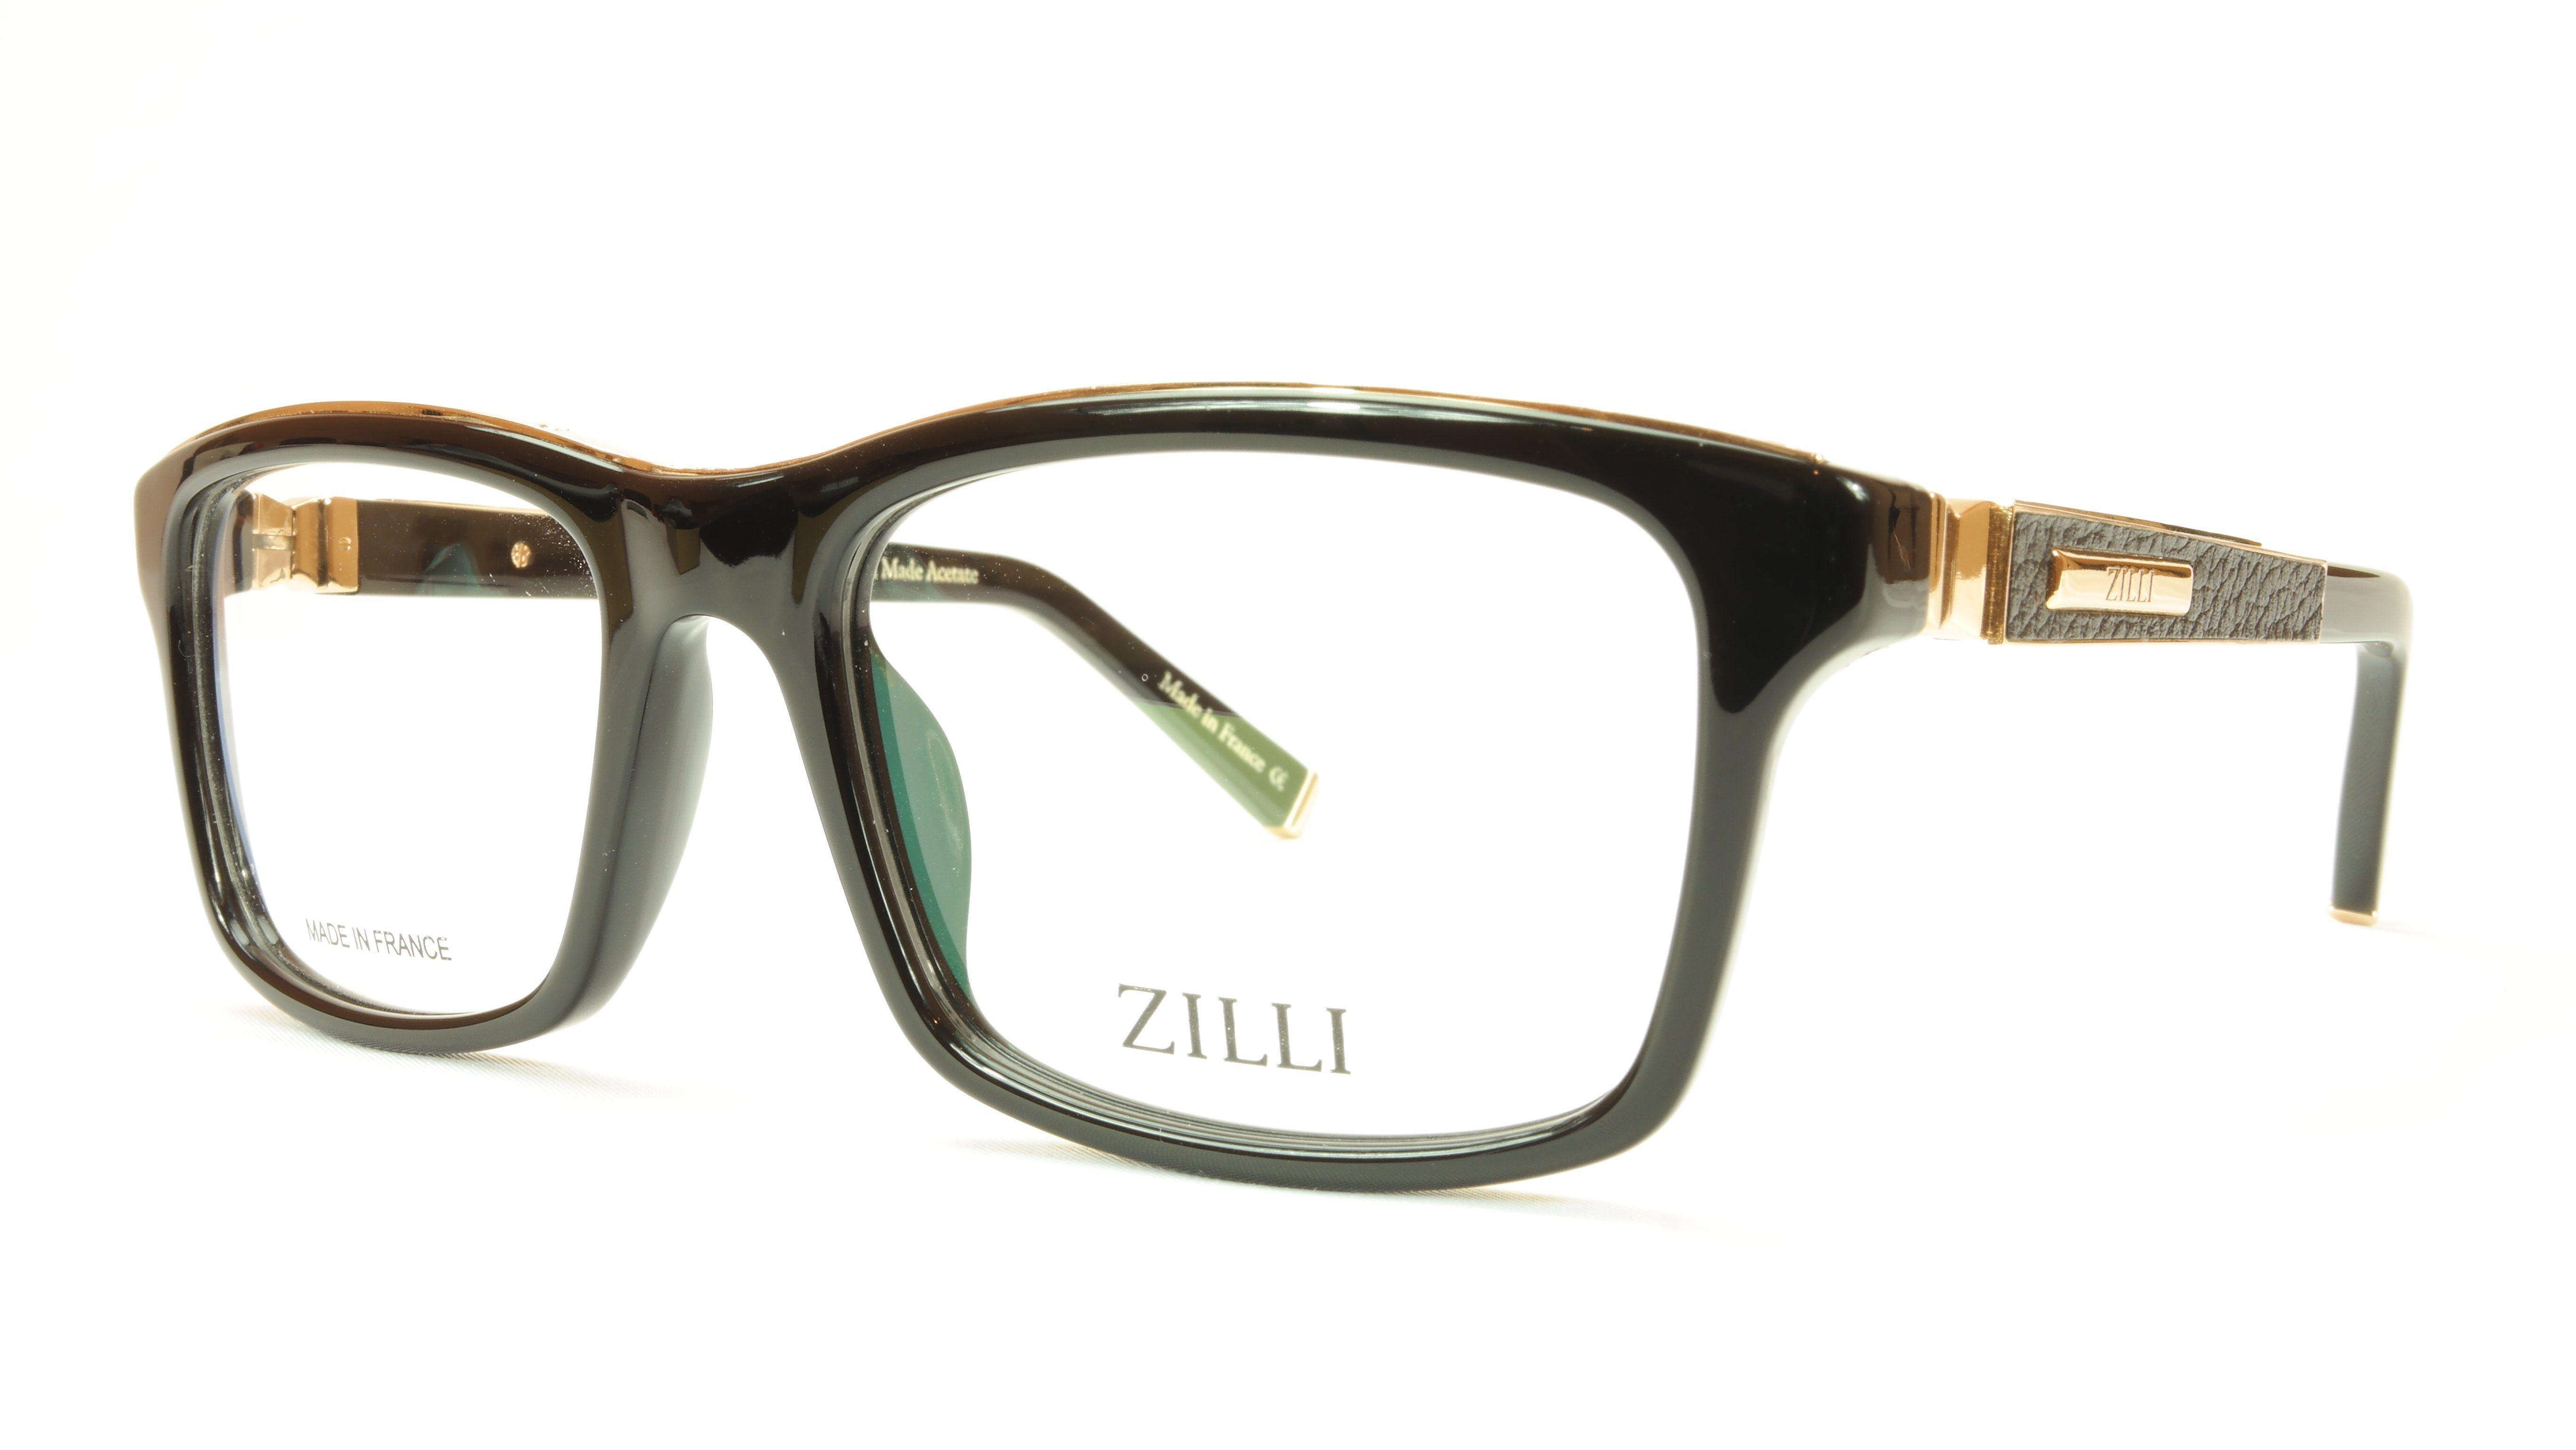 8cff8f9703c ZILLI Eyeglasses Frame Acetate Leather Titanium France Hand Made ZI 60001  C01